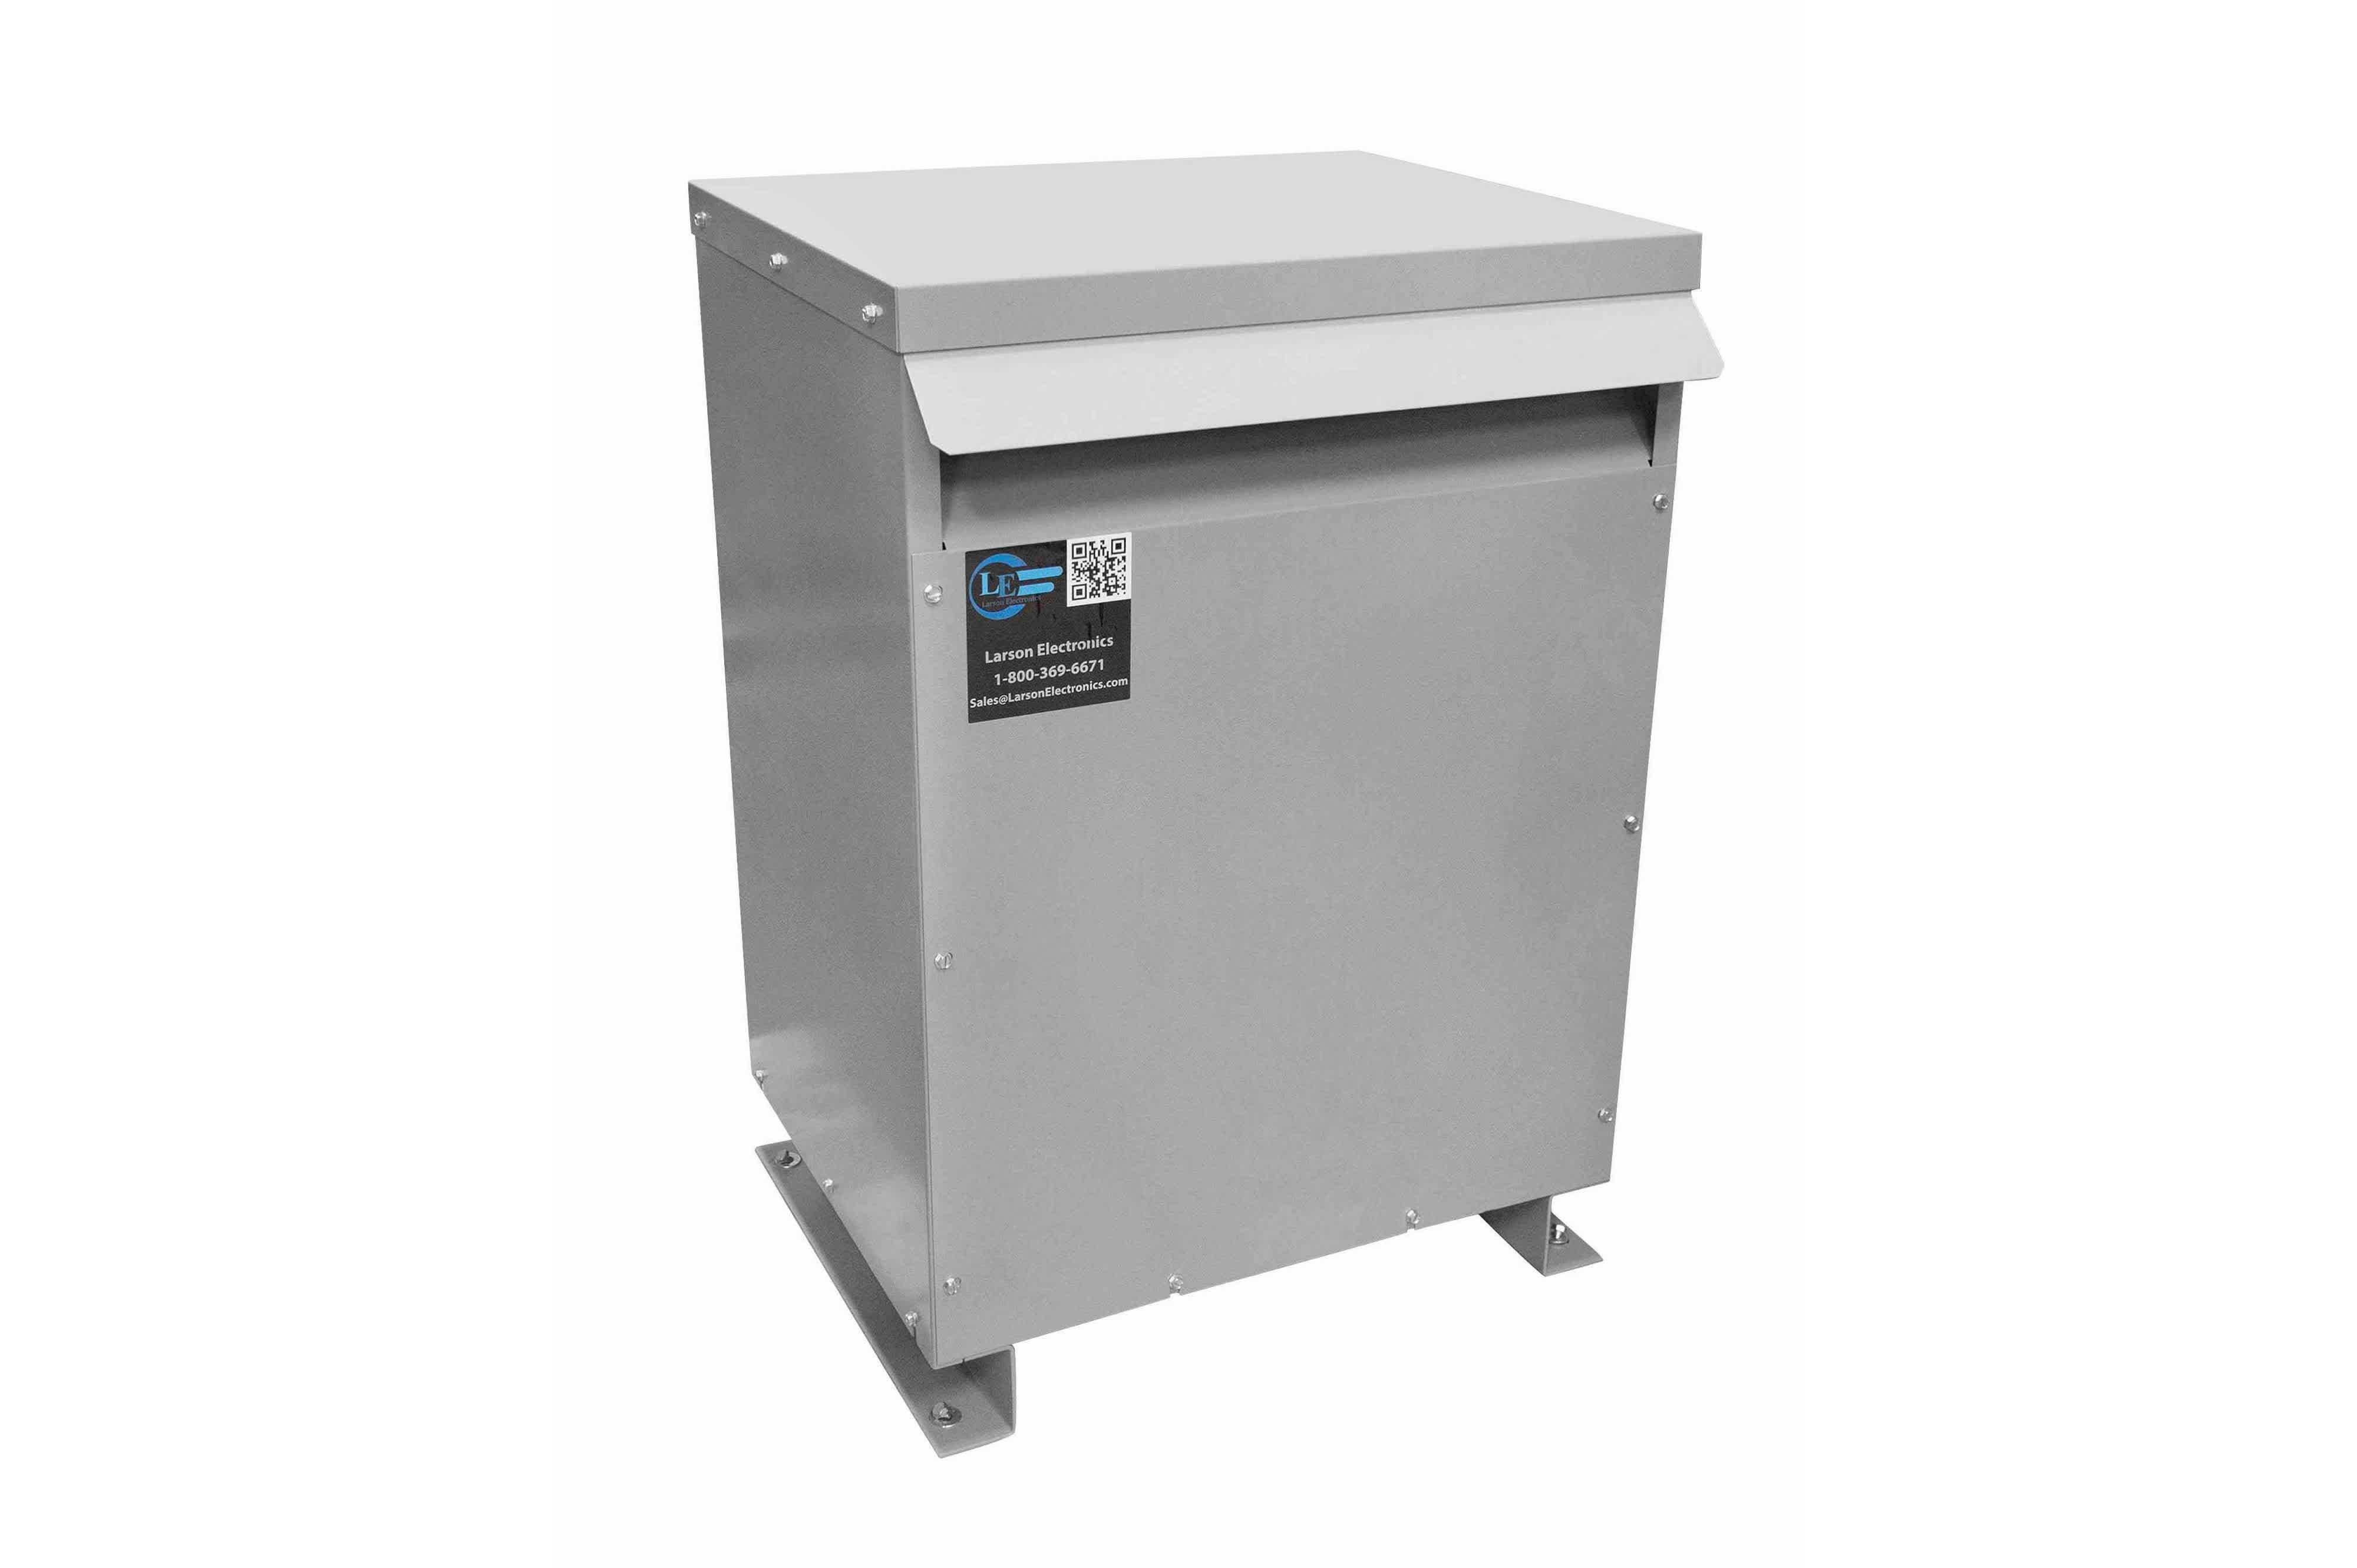 60 kVA 3PH DOE Transformer, 575V Delta Primary, 415Y/240 Wye-N Secondary, N3R, Ventilated, 60 Hz